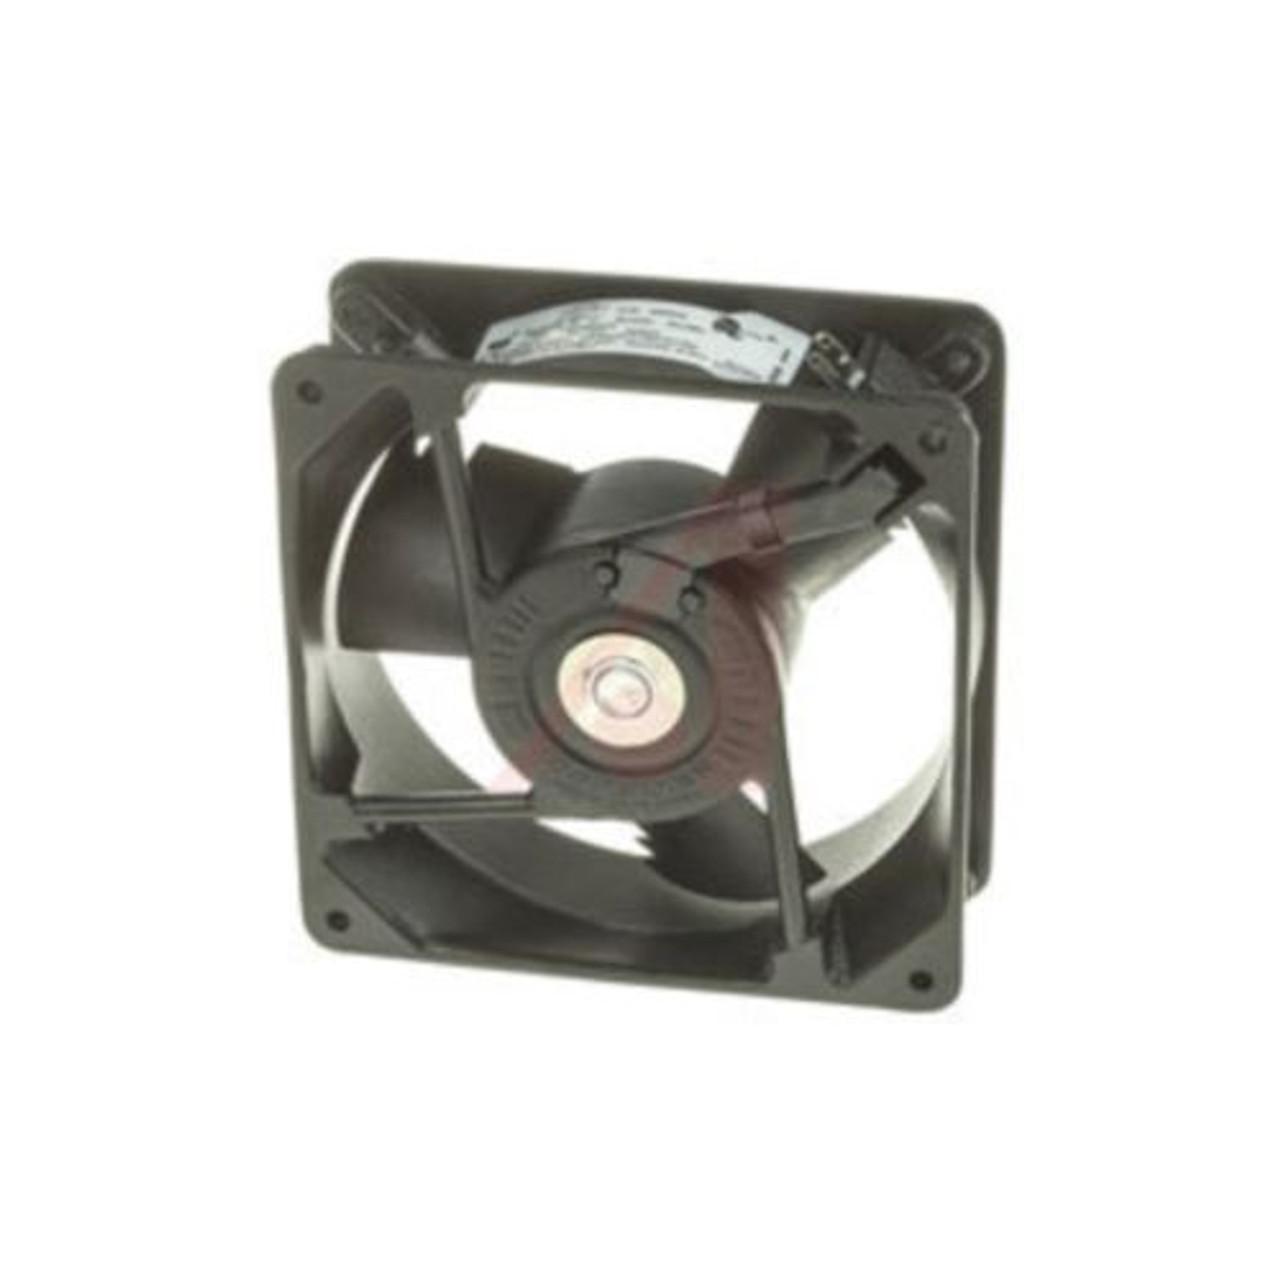 Leviton Colortran ENR 12 dimming rack fan, comparable